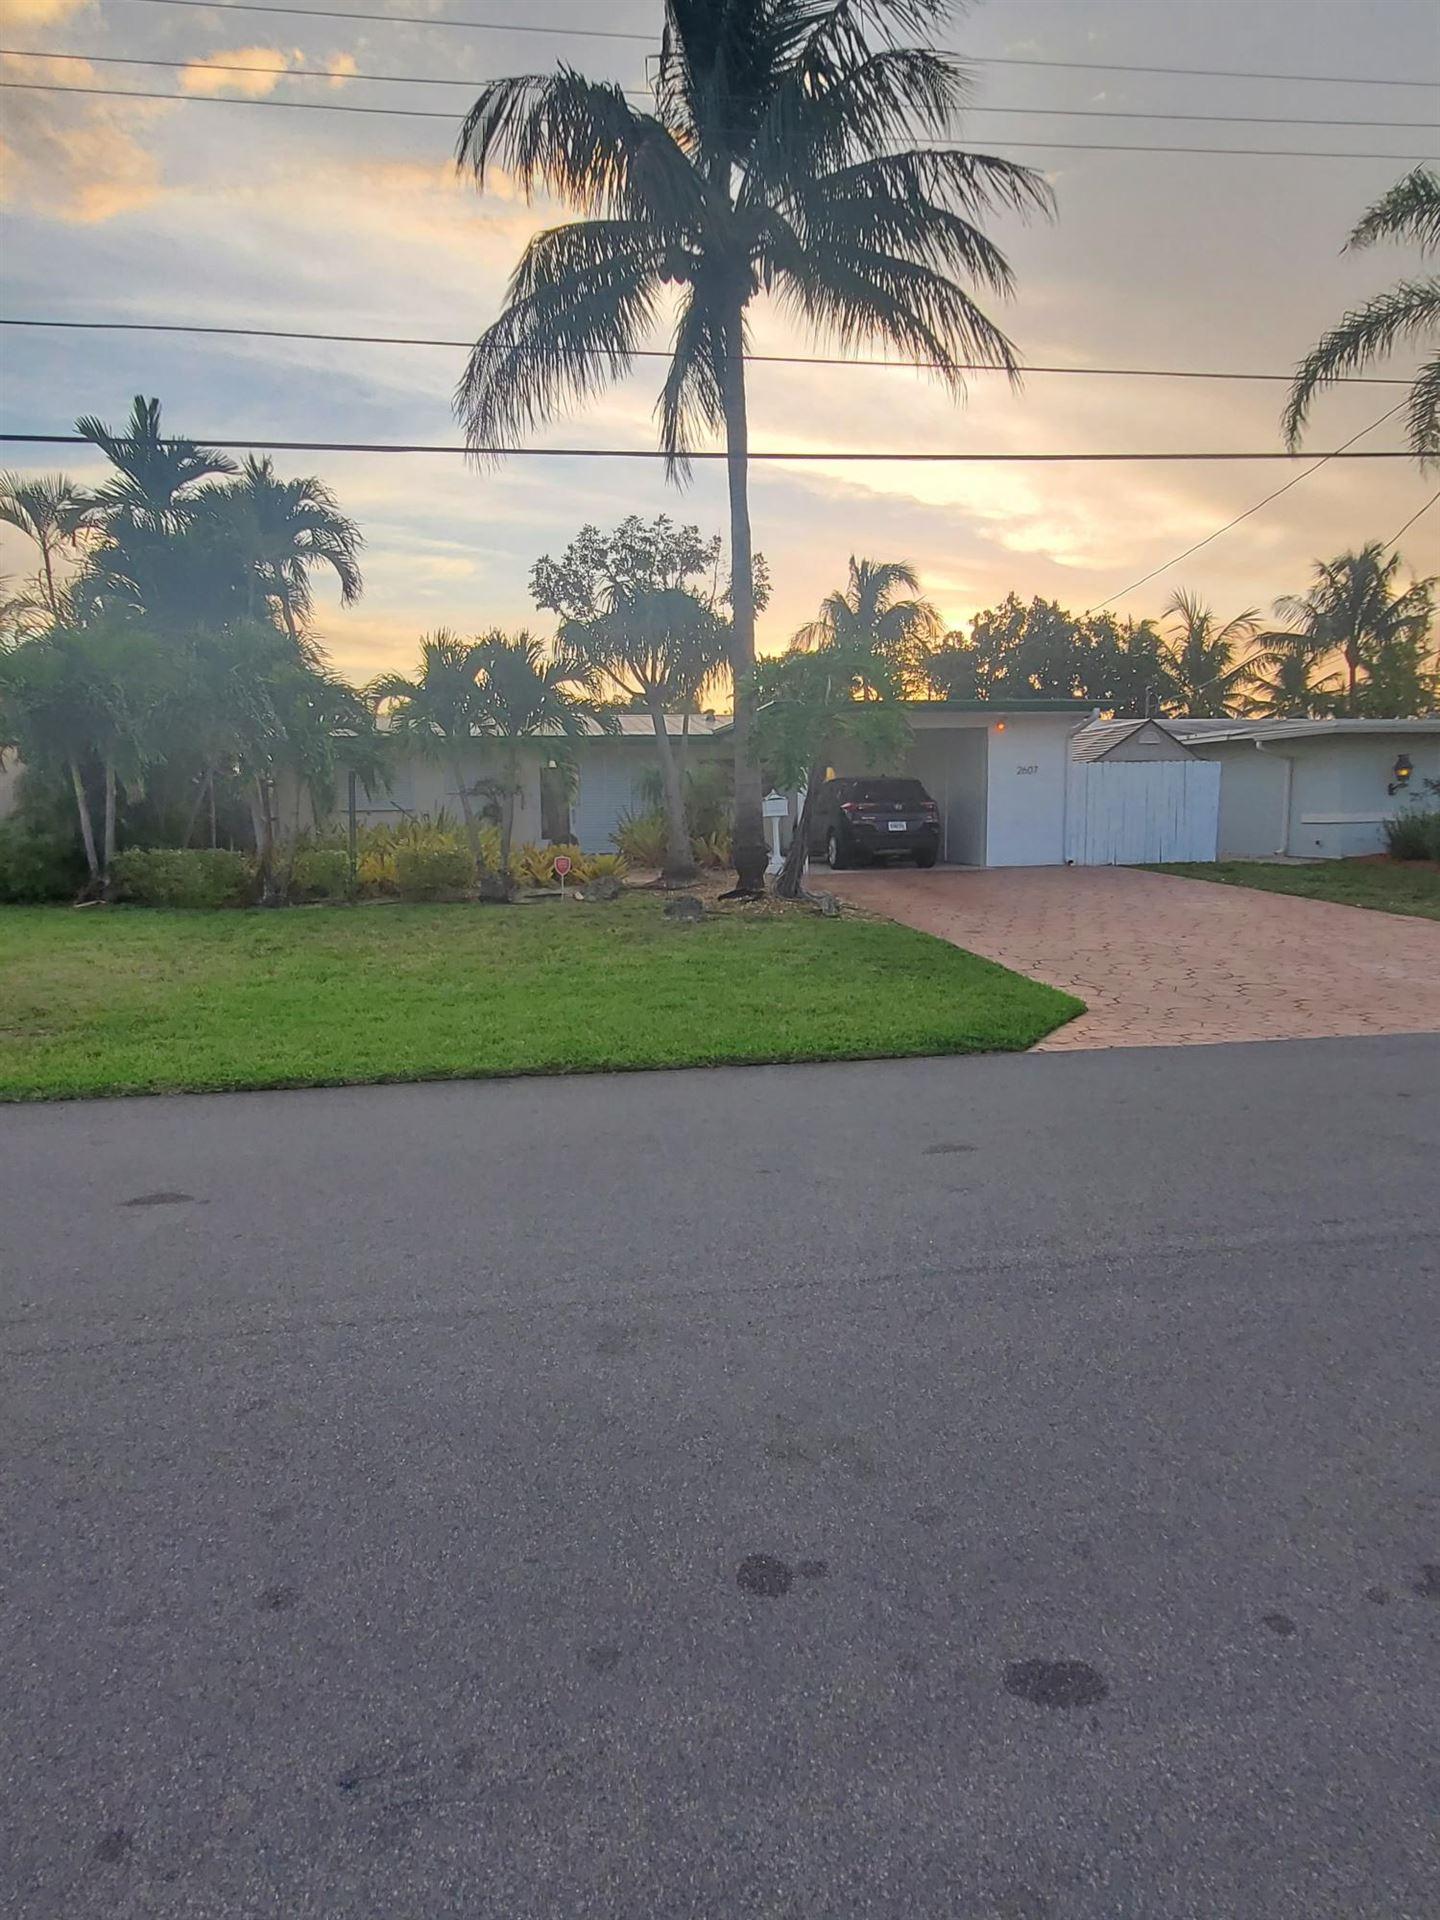 2607 Nassau Lane, Fort Lauderdale, FL 33312 - MLS#: RX-10715147